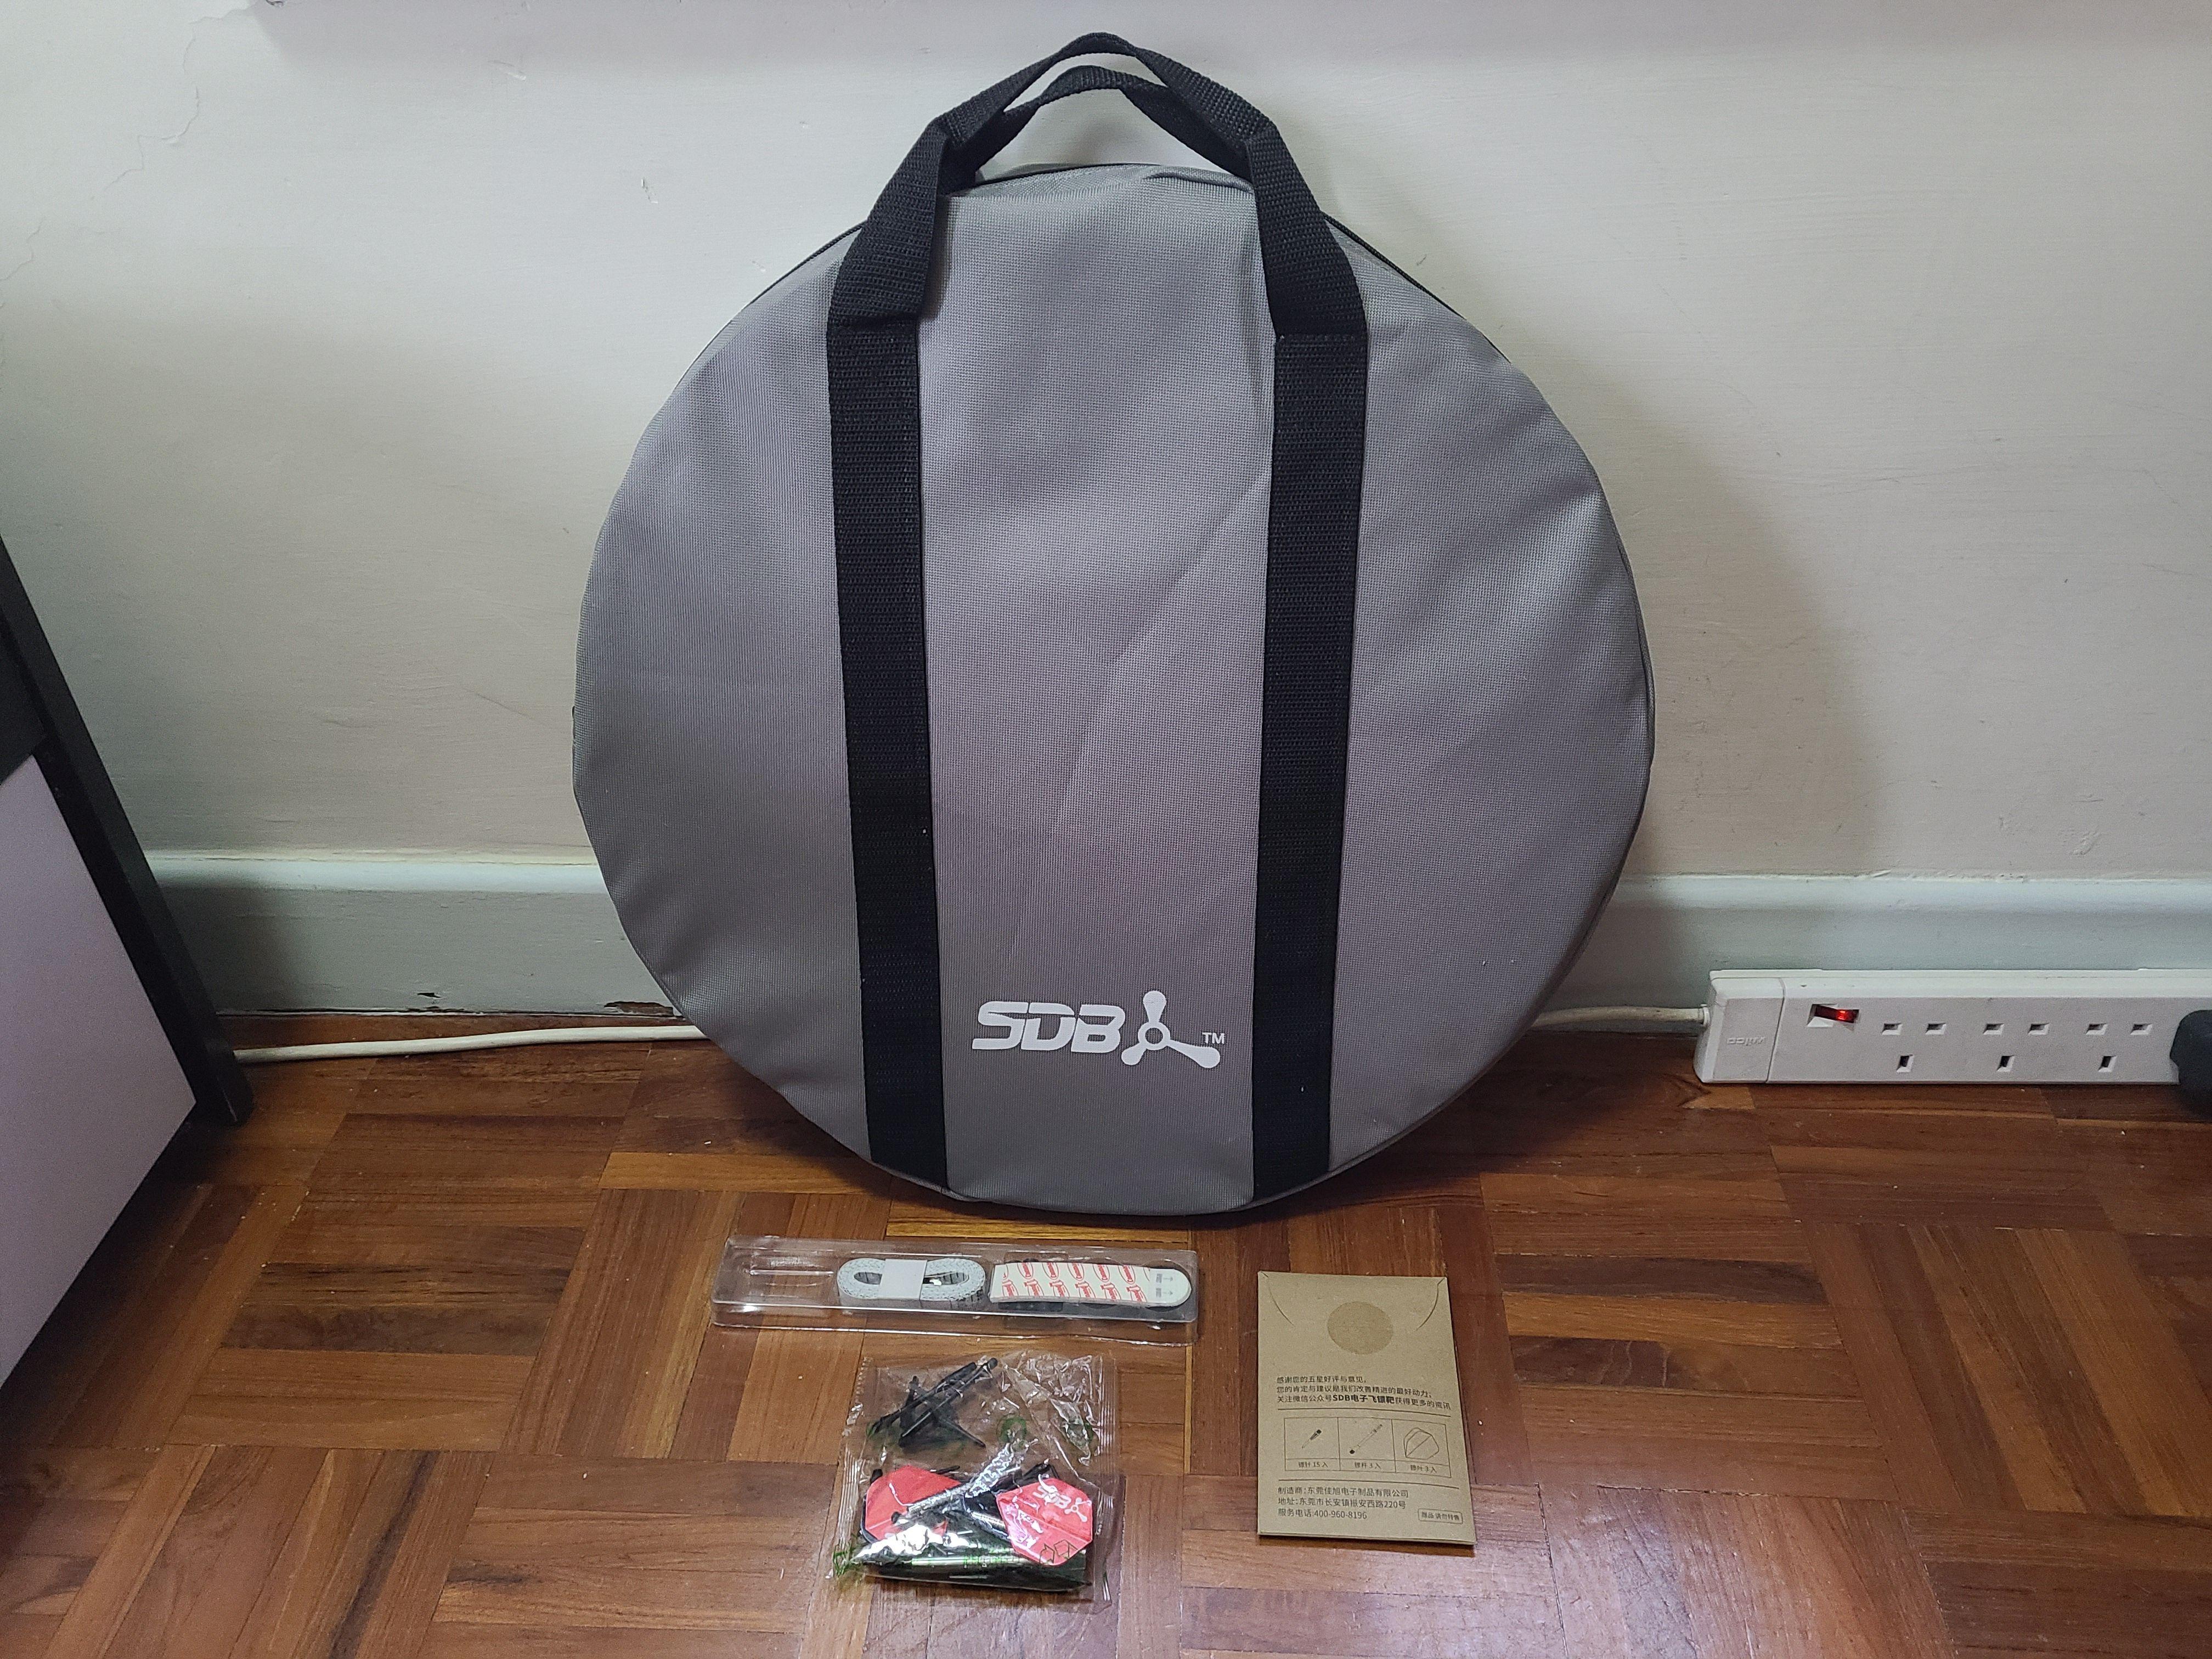 SDB A1 包裝盒內的所有物品